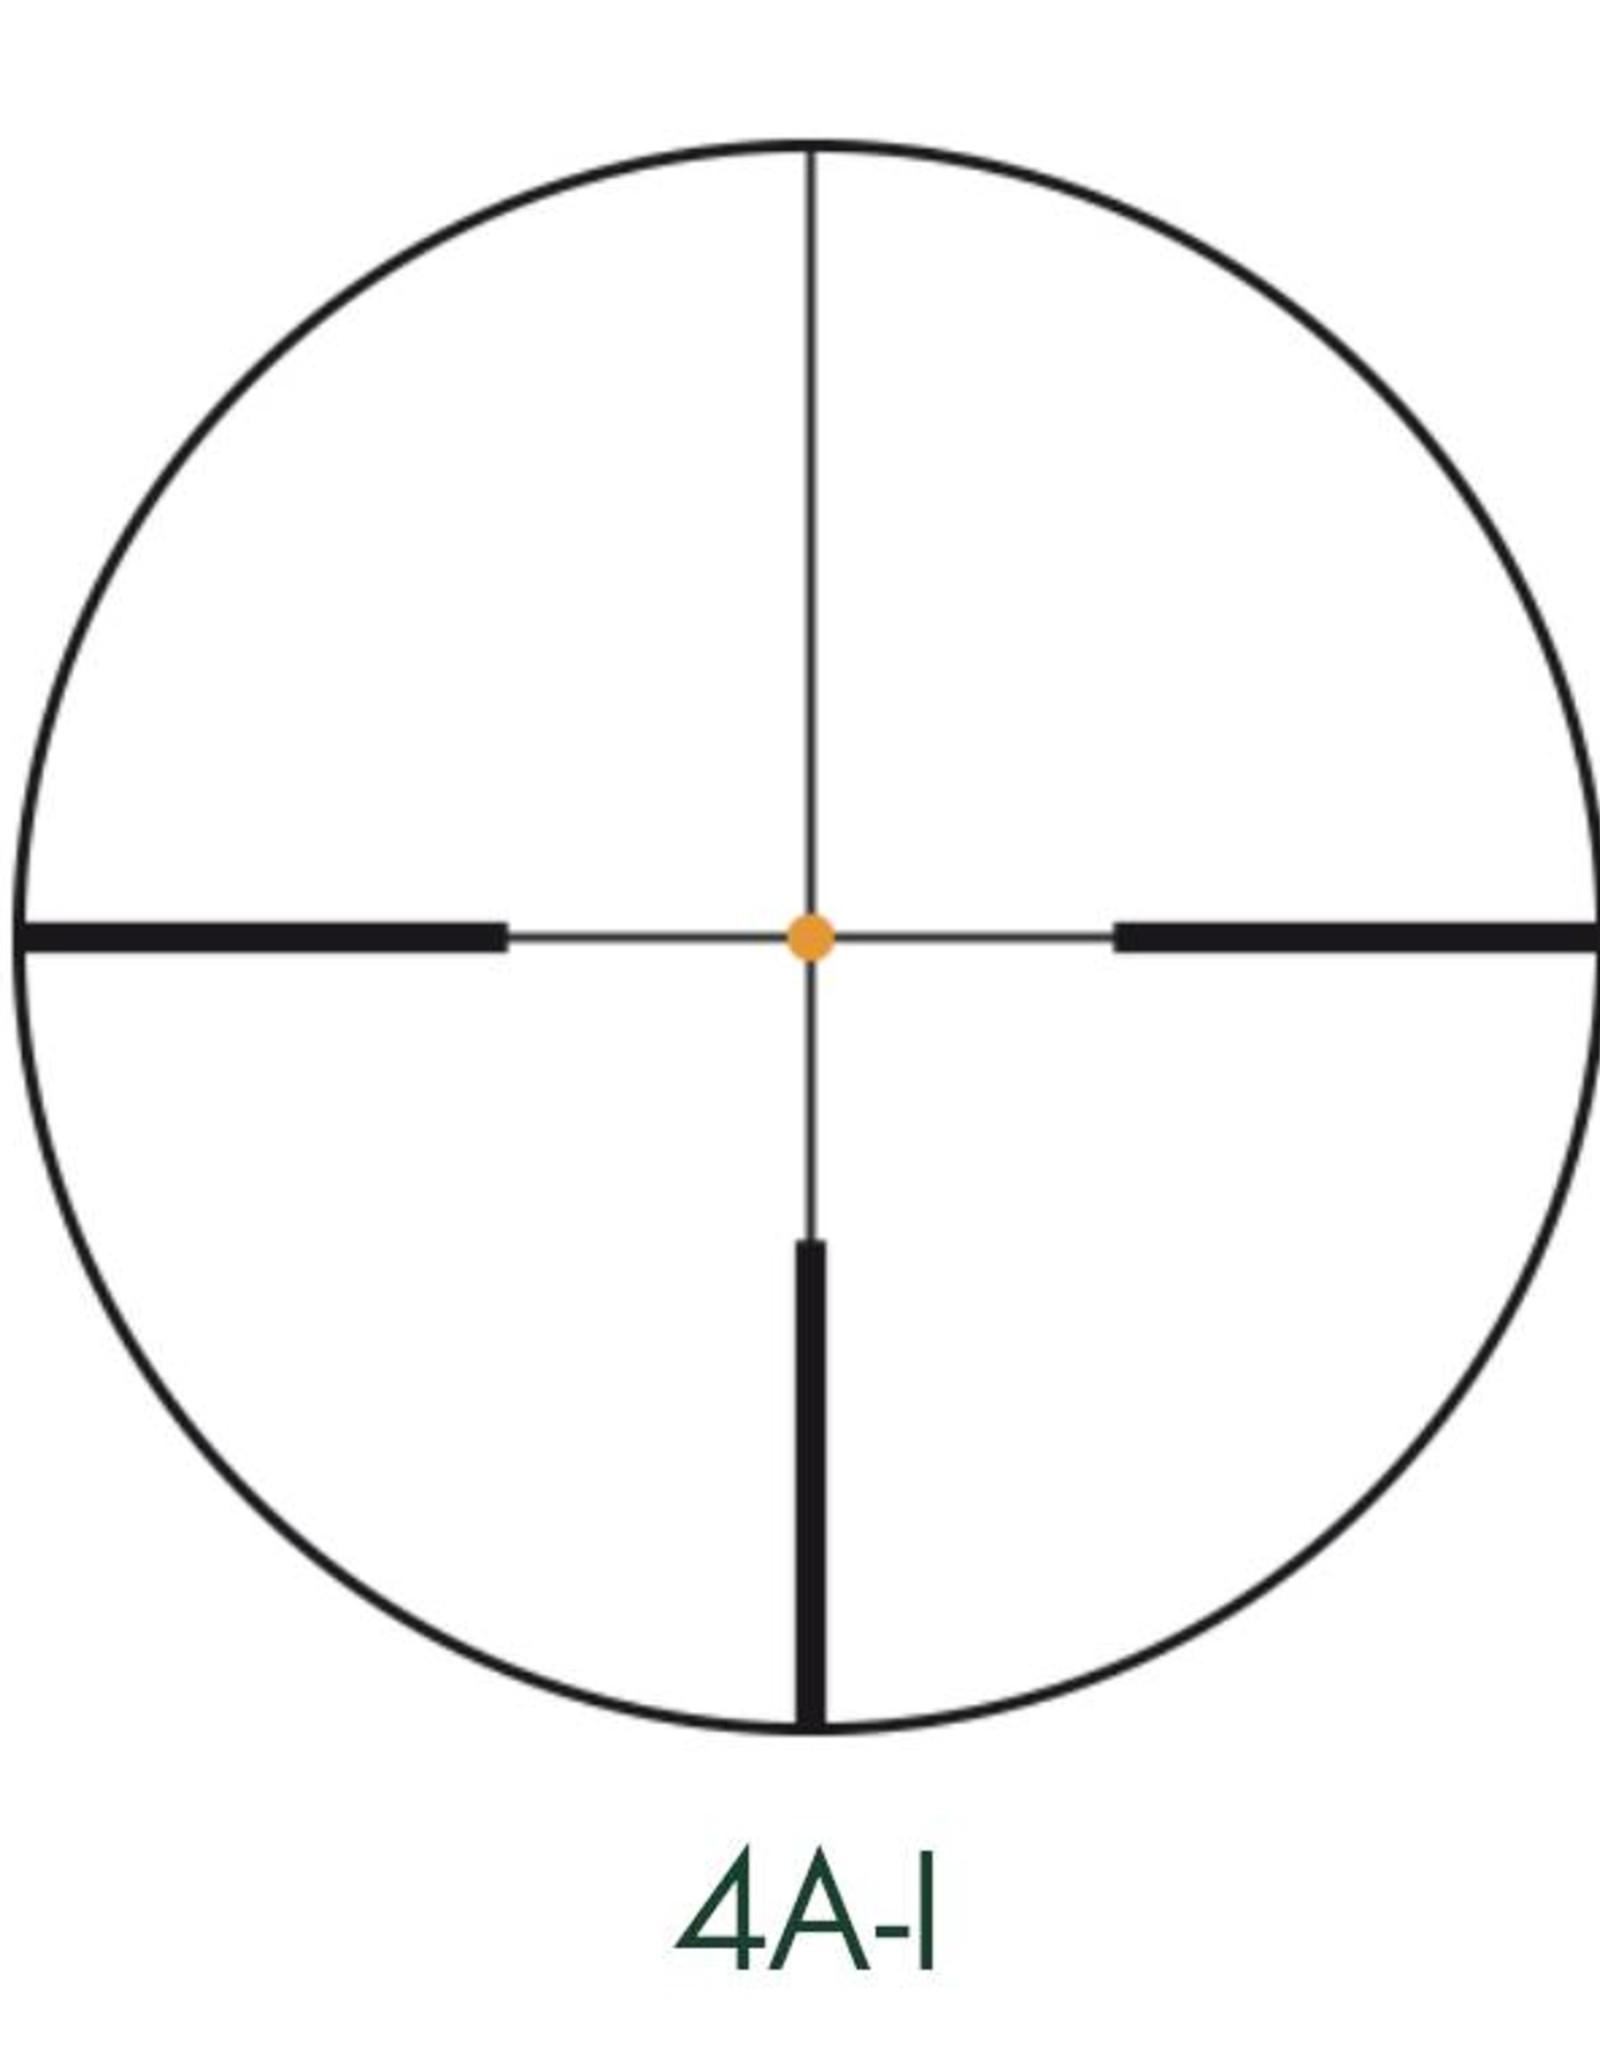 Swarovski Optik DS Digital Riflescope